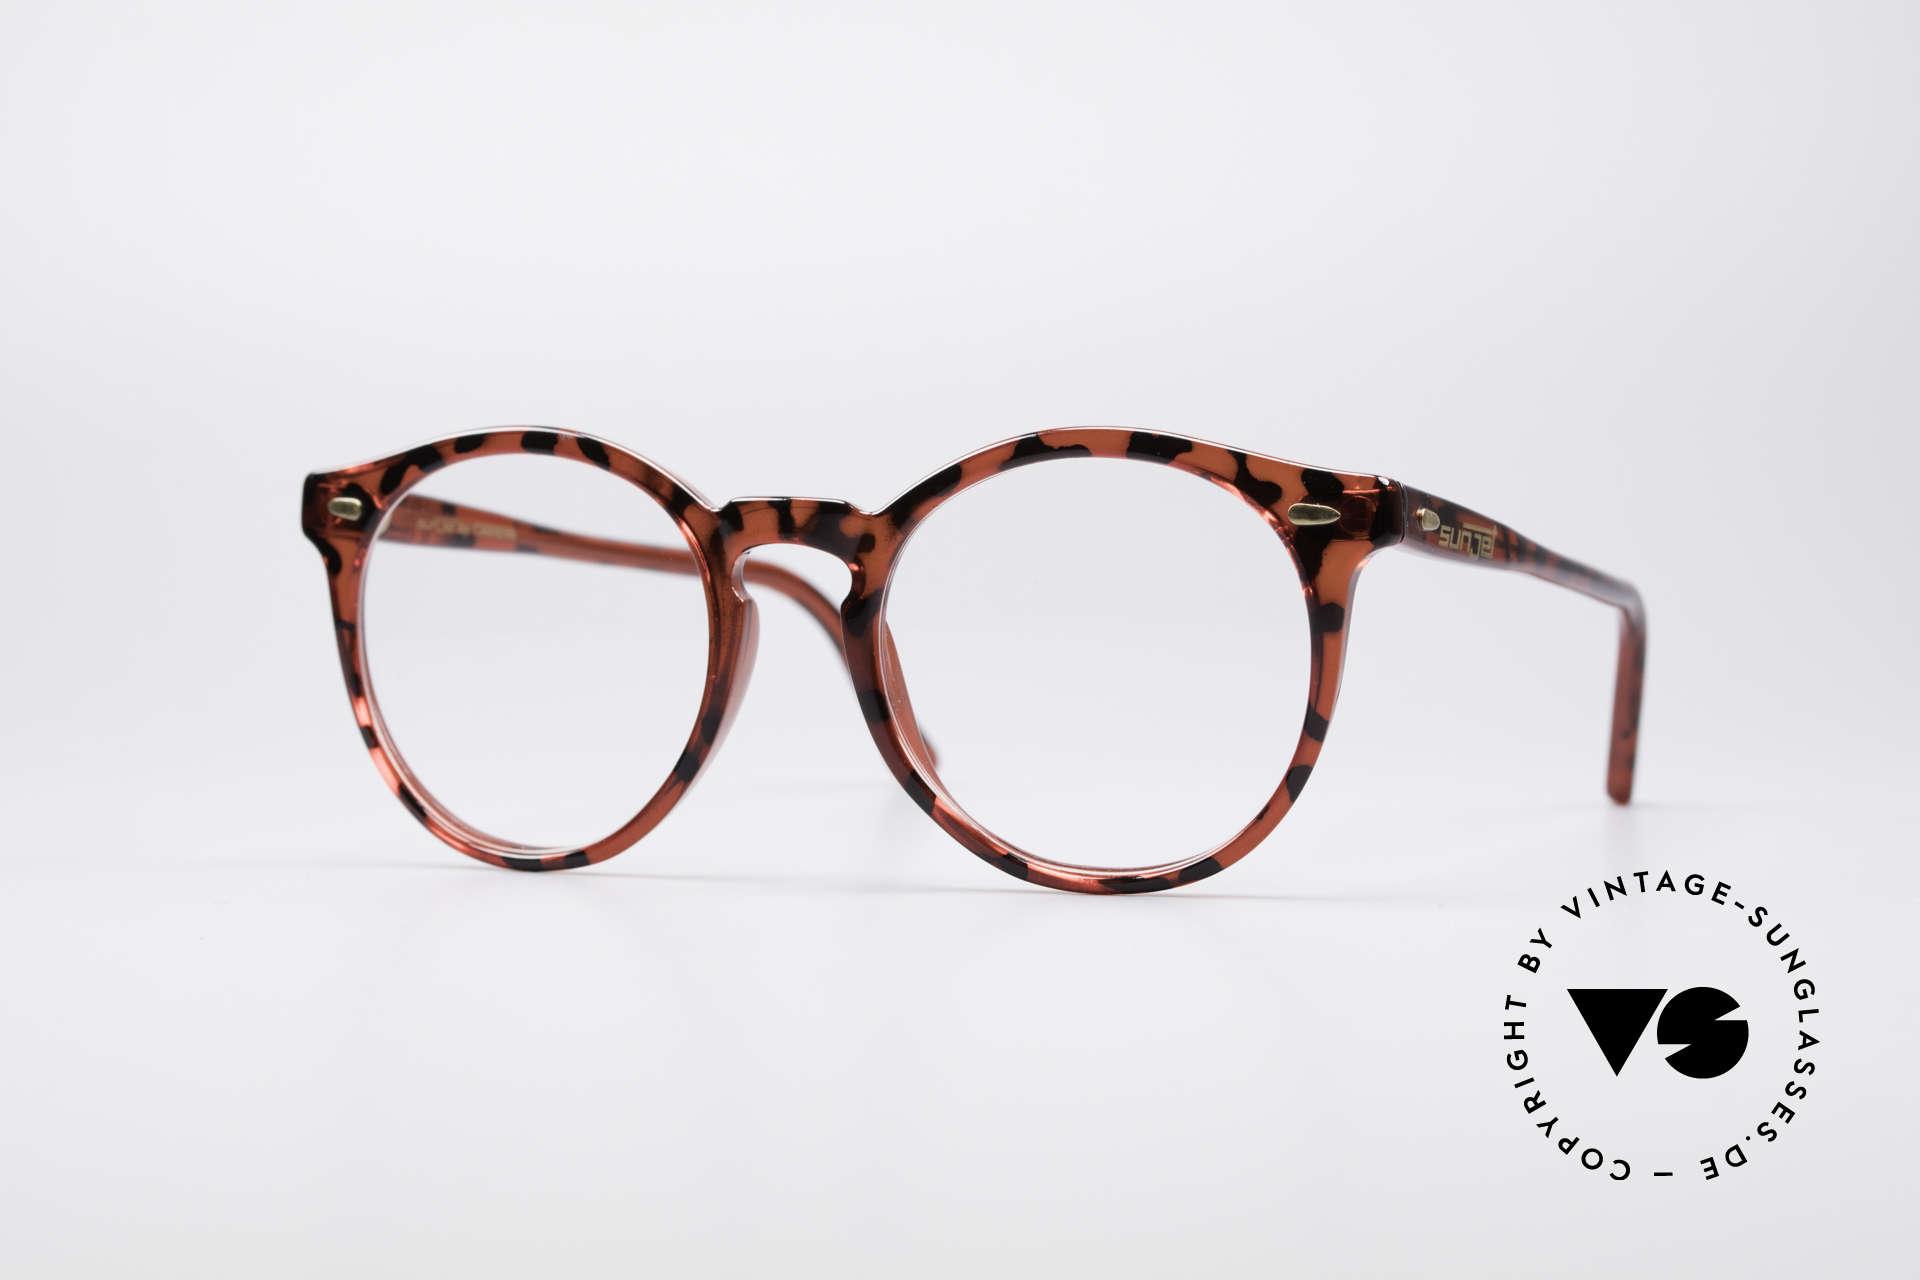 9c9393f8cc Glasses Carrera 5256 Johnny Depp Glasses